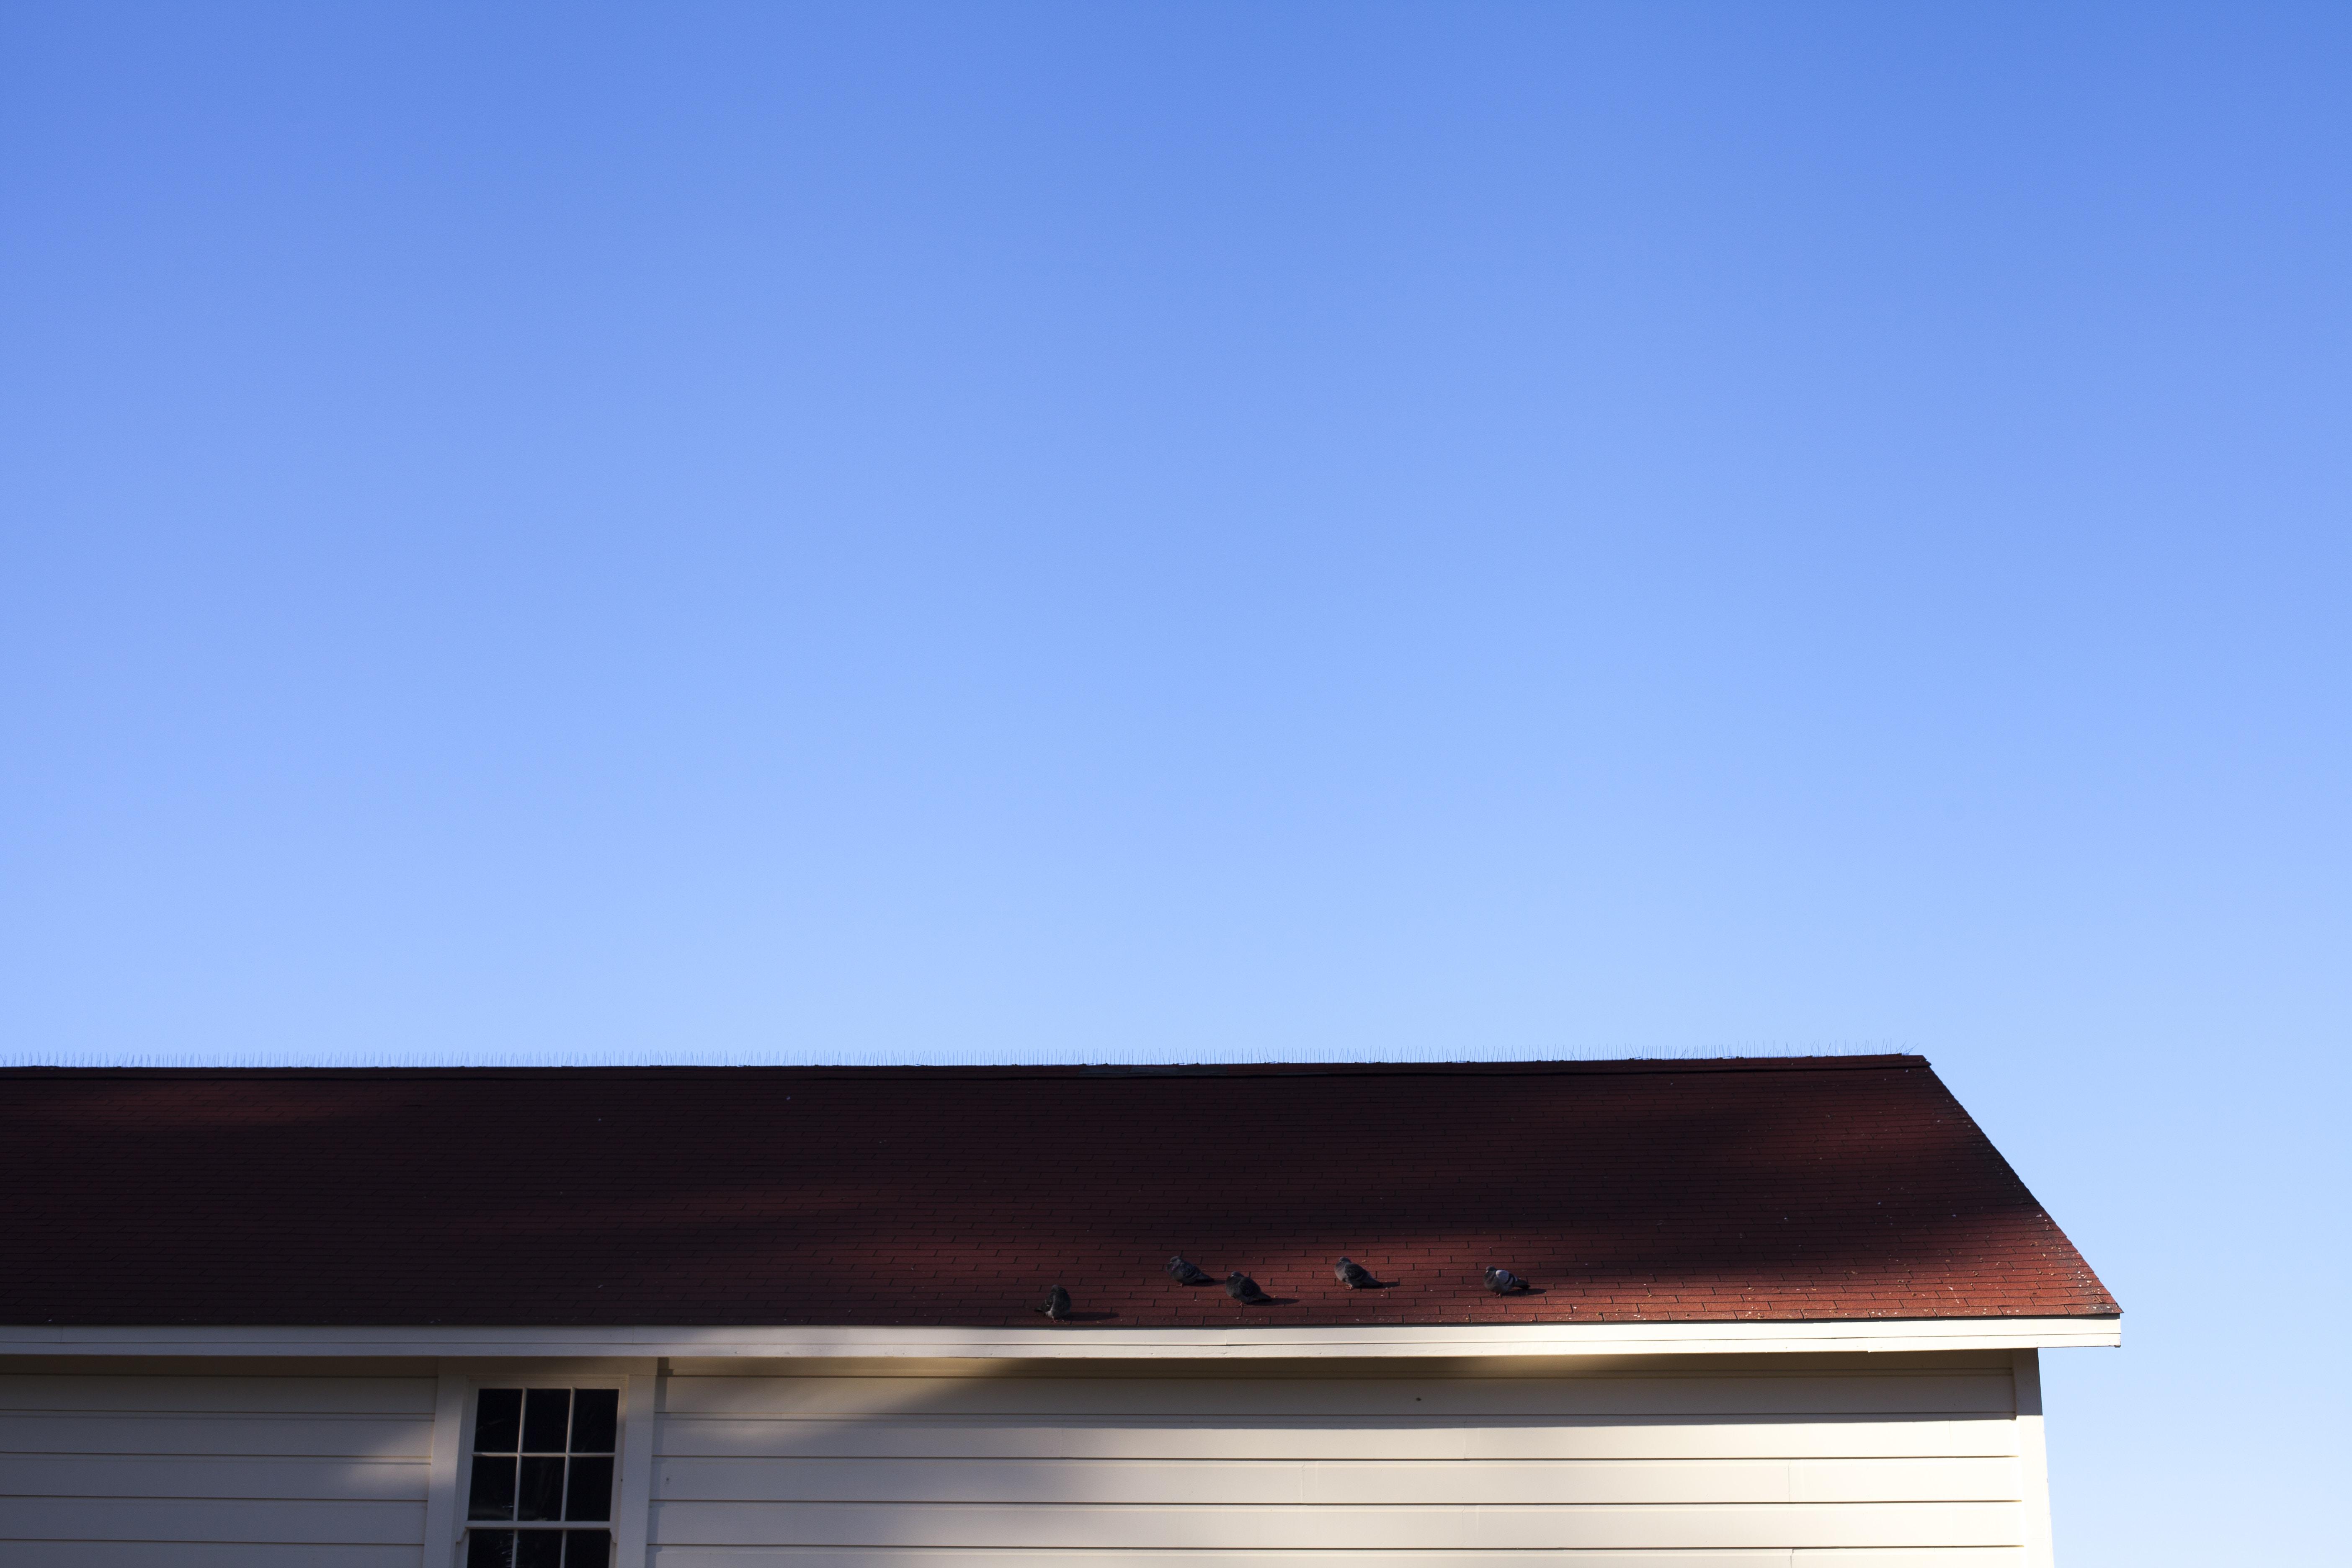 brown wooden roof